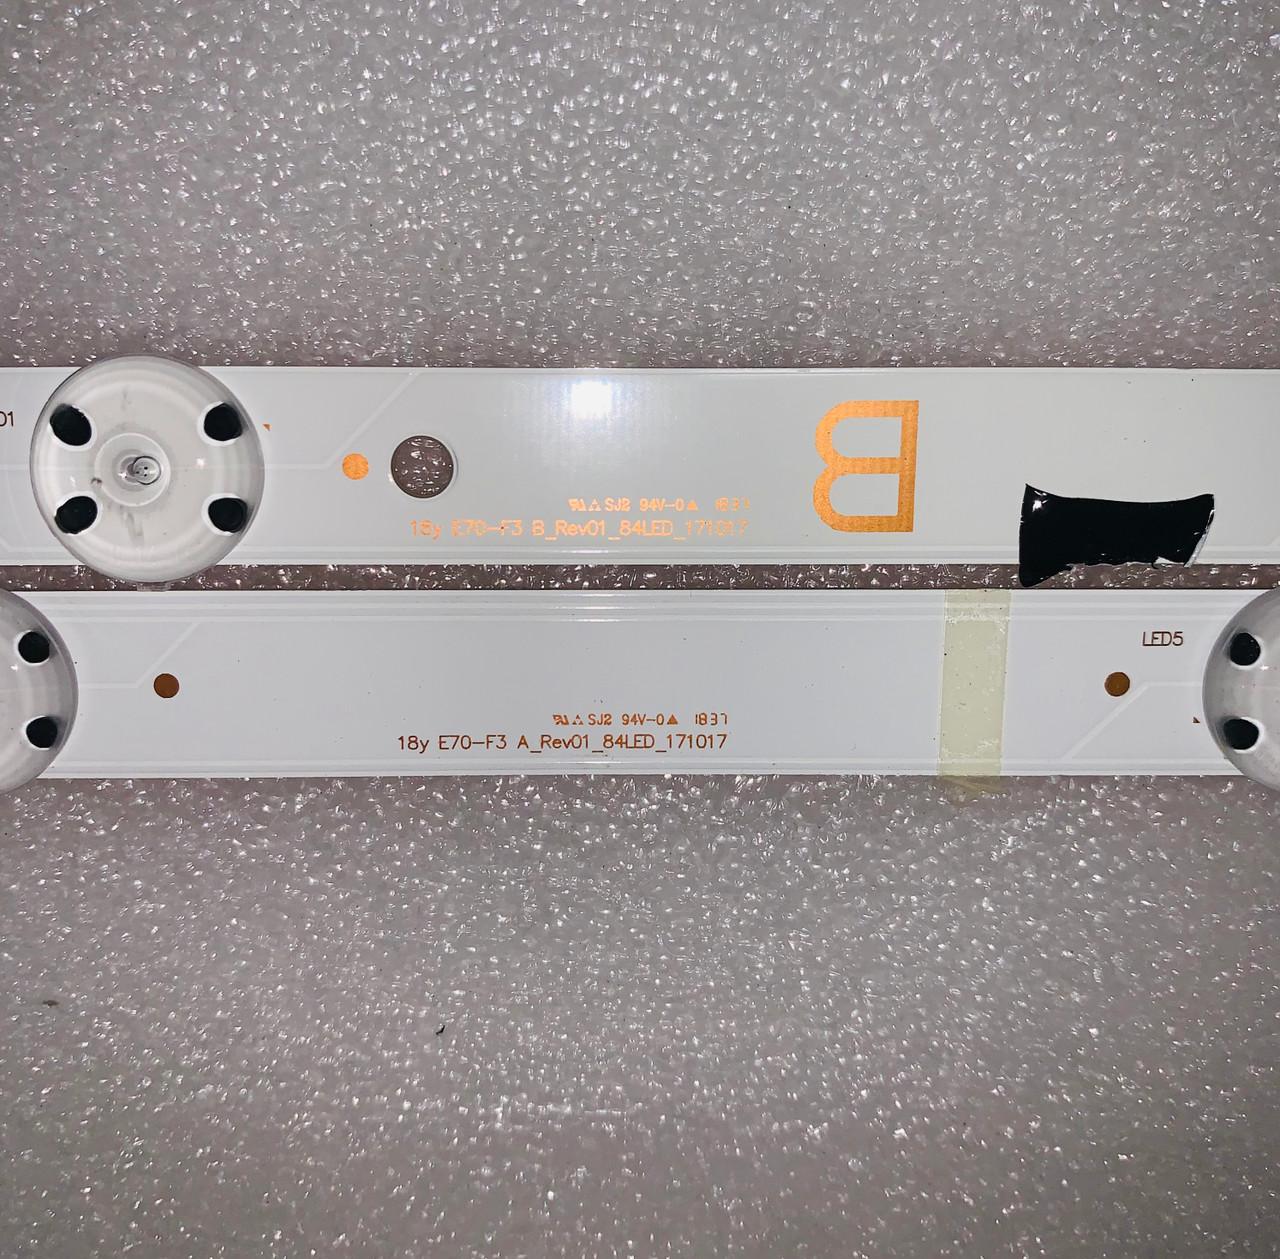 Vizio E70-F3 LED Light Strips set of 12 171017